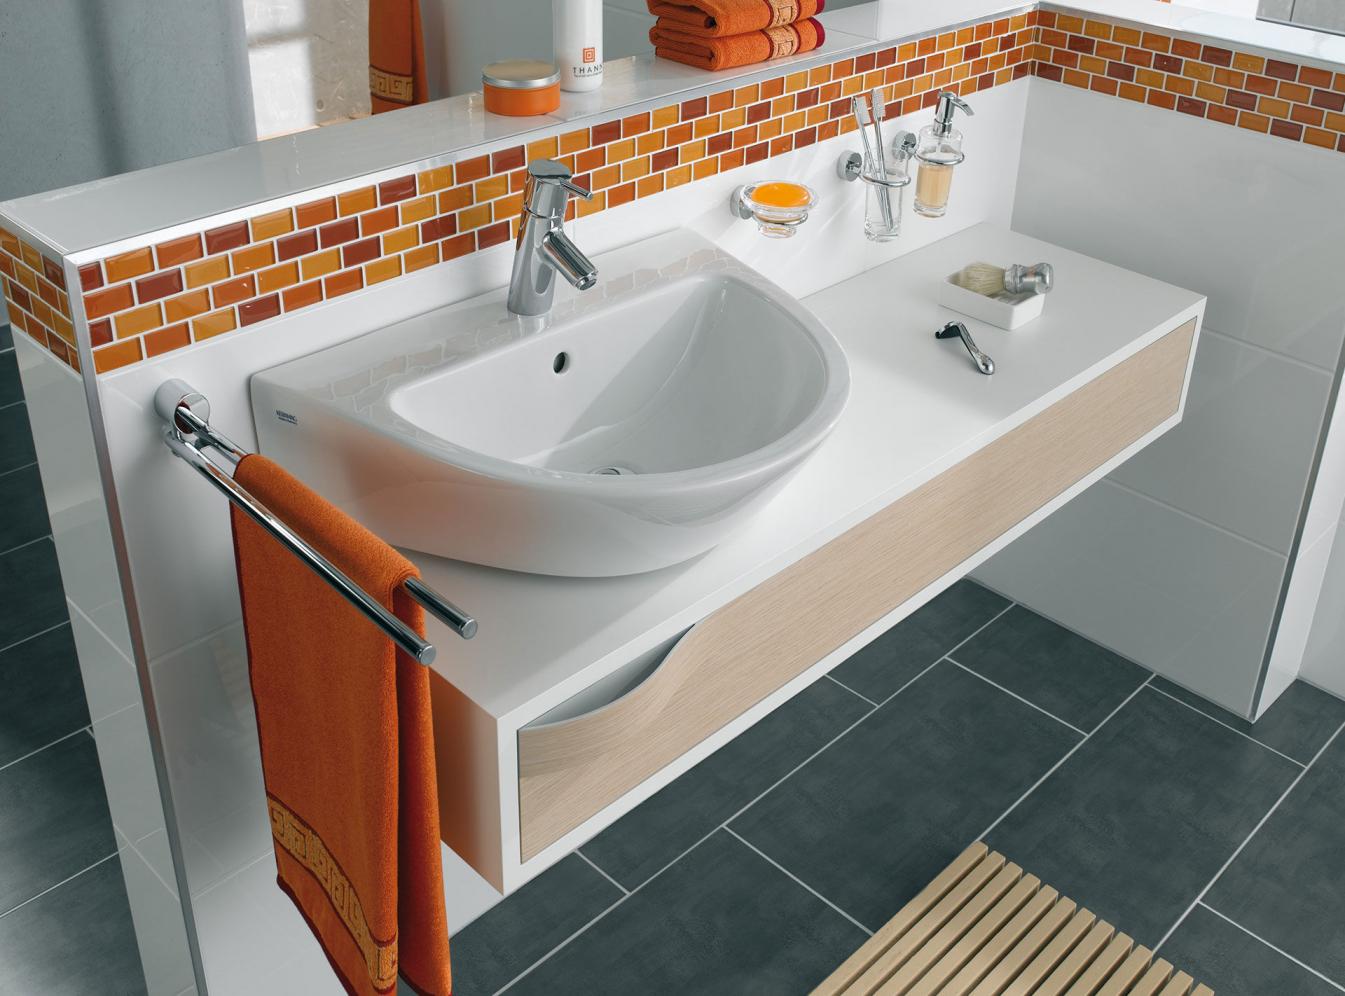 emco loft fl ssigseifenspenderemco rondo2 glashalter. Black Bedroom Furniture Sets. Home Design Ideas